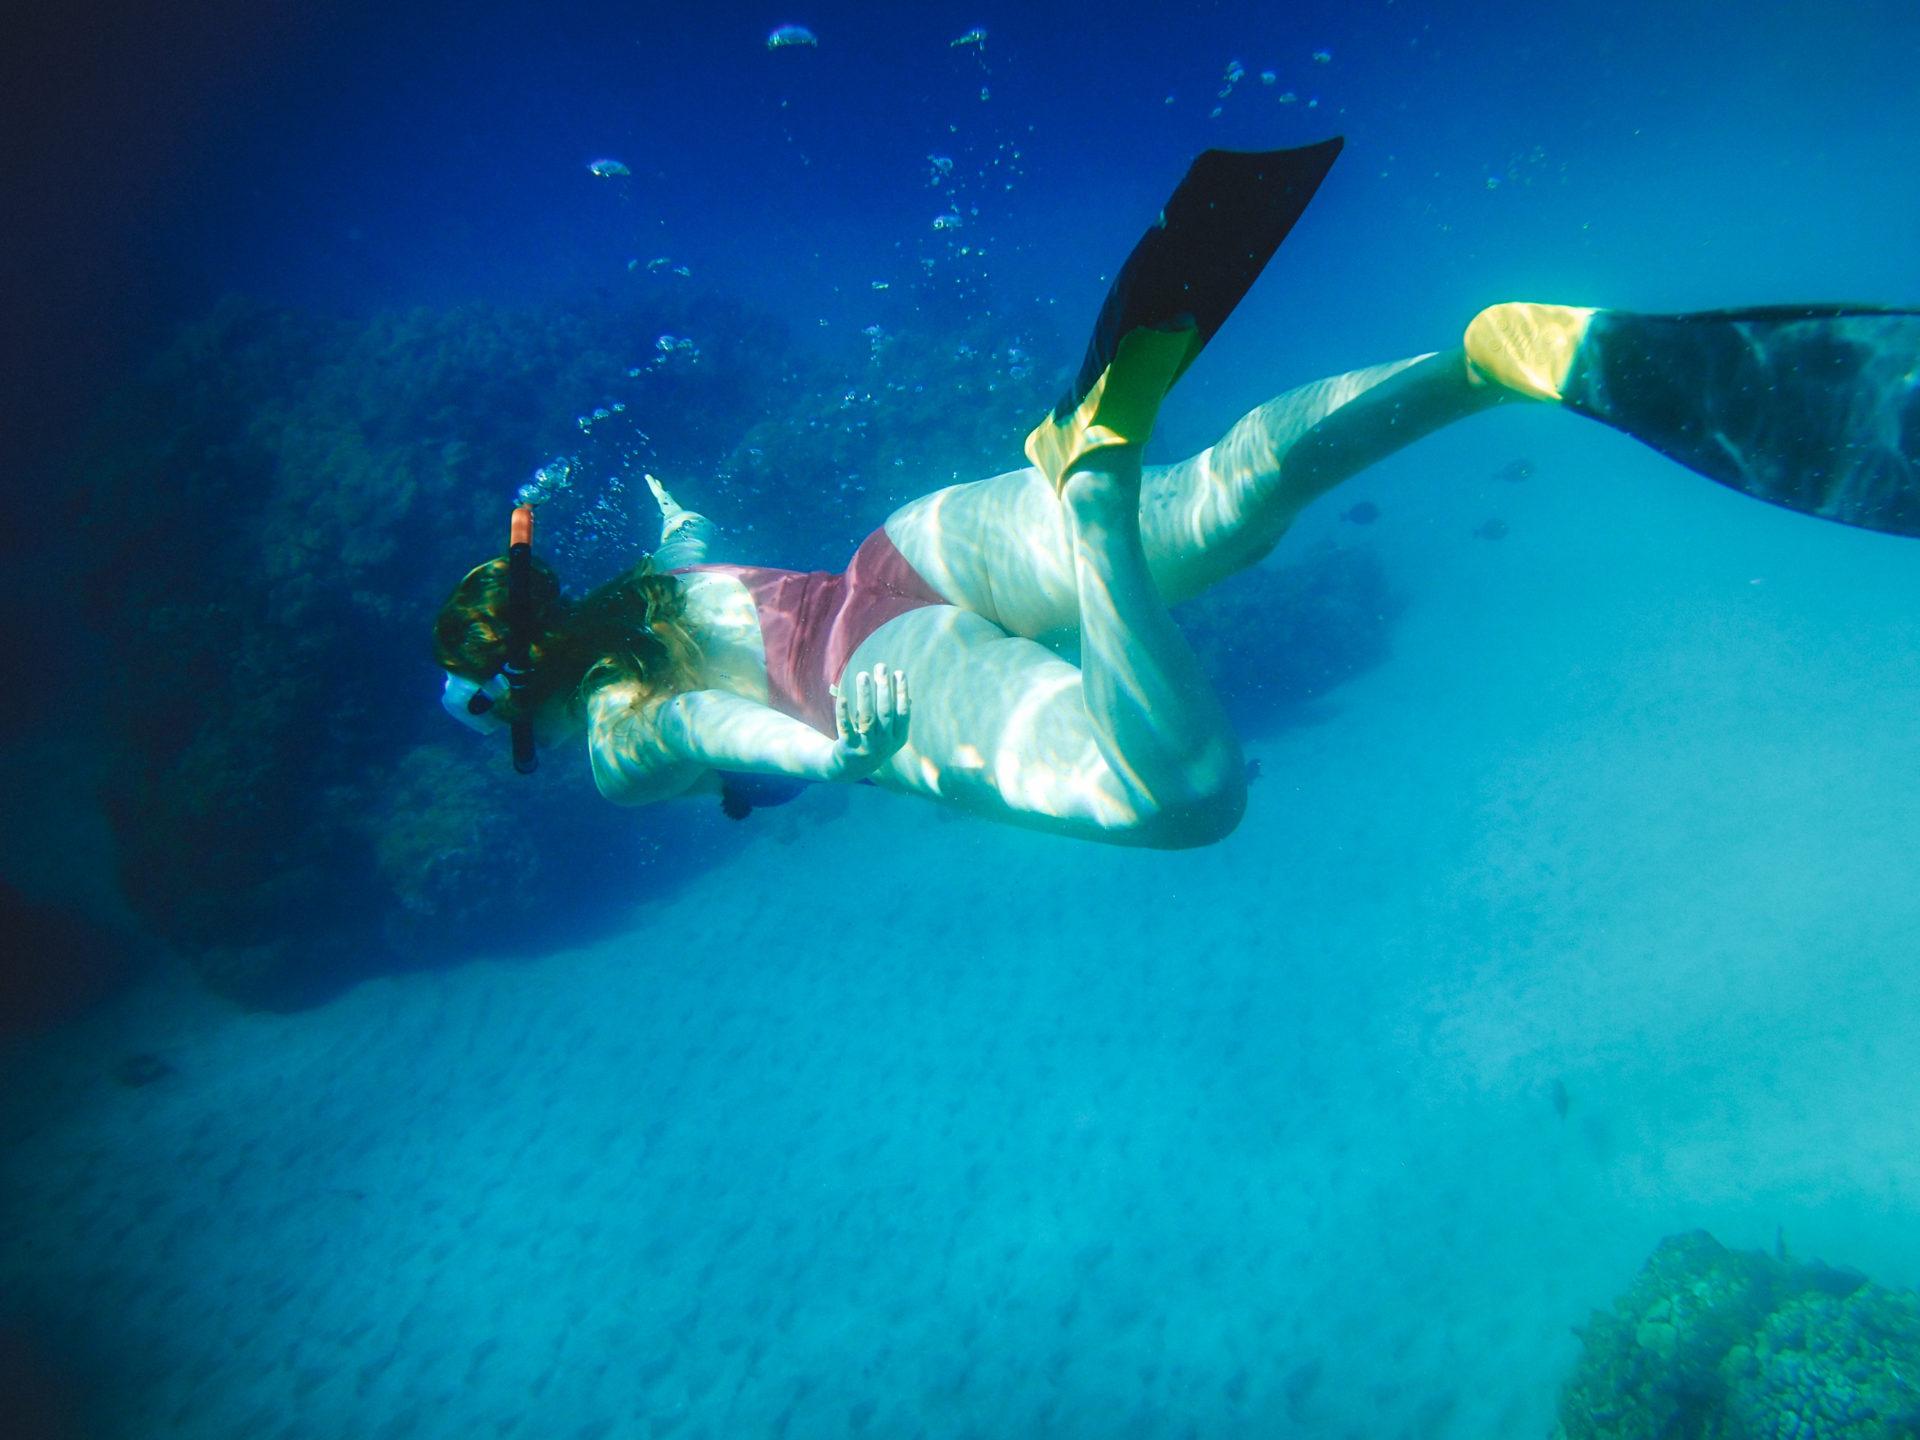 Snorkel Maui Hawaii Cruise - woman snorkeling in coral reef